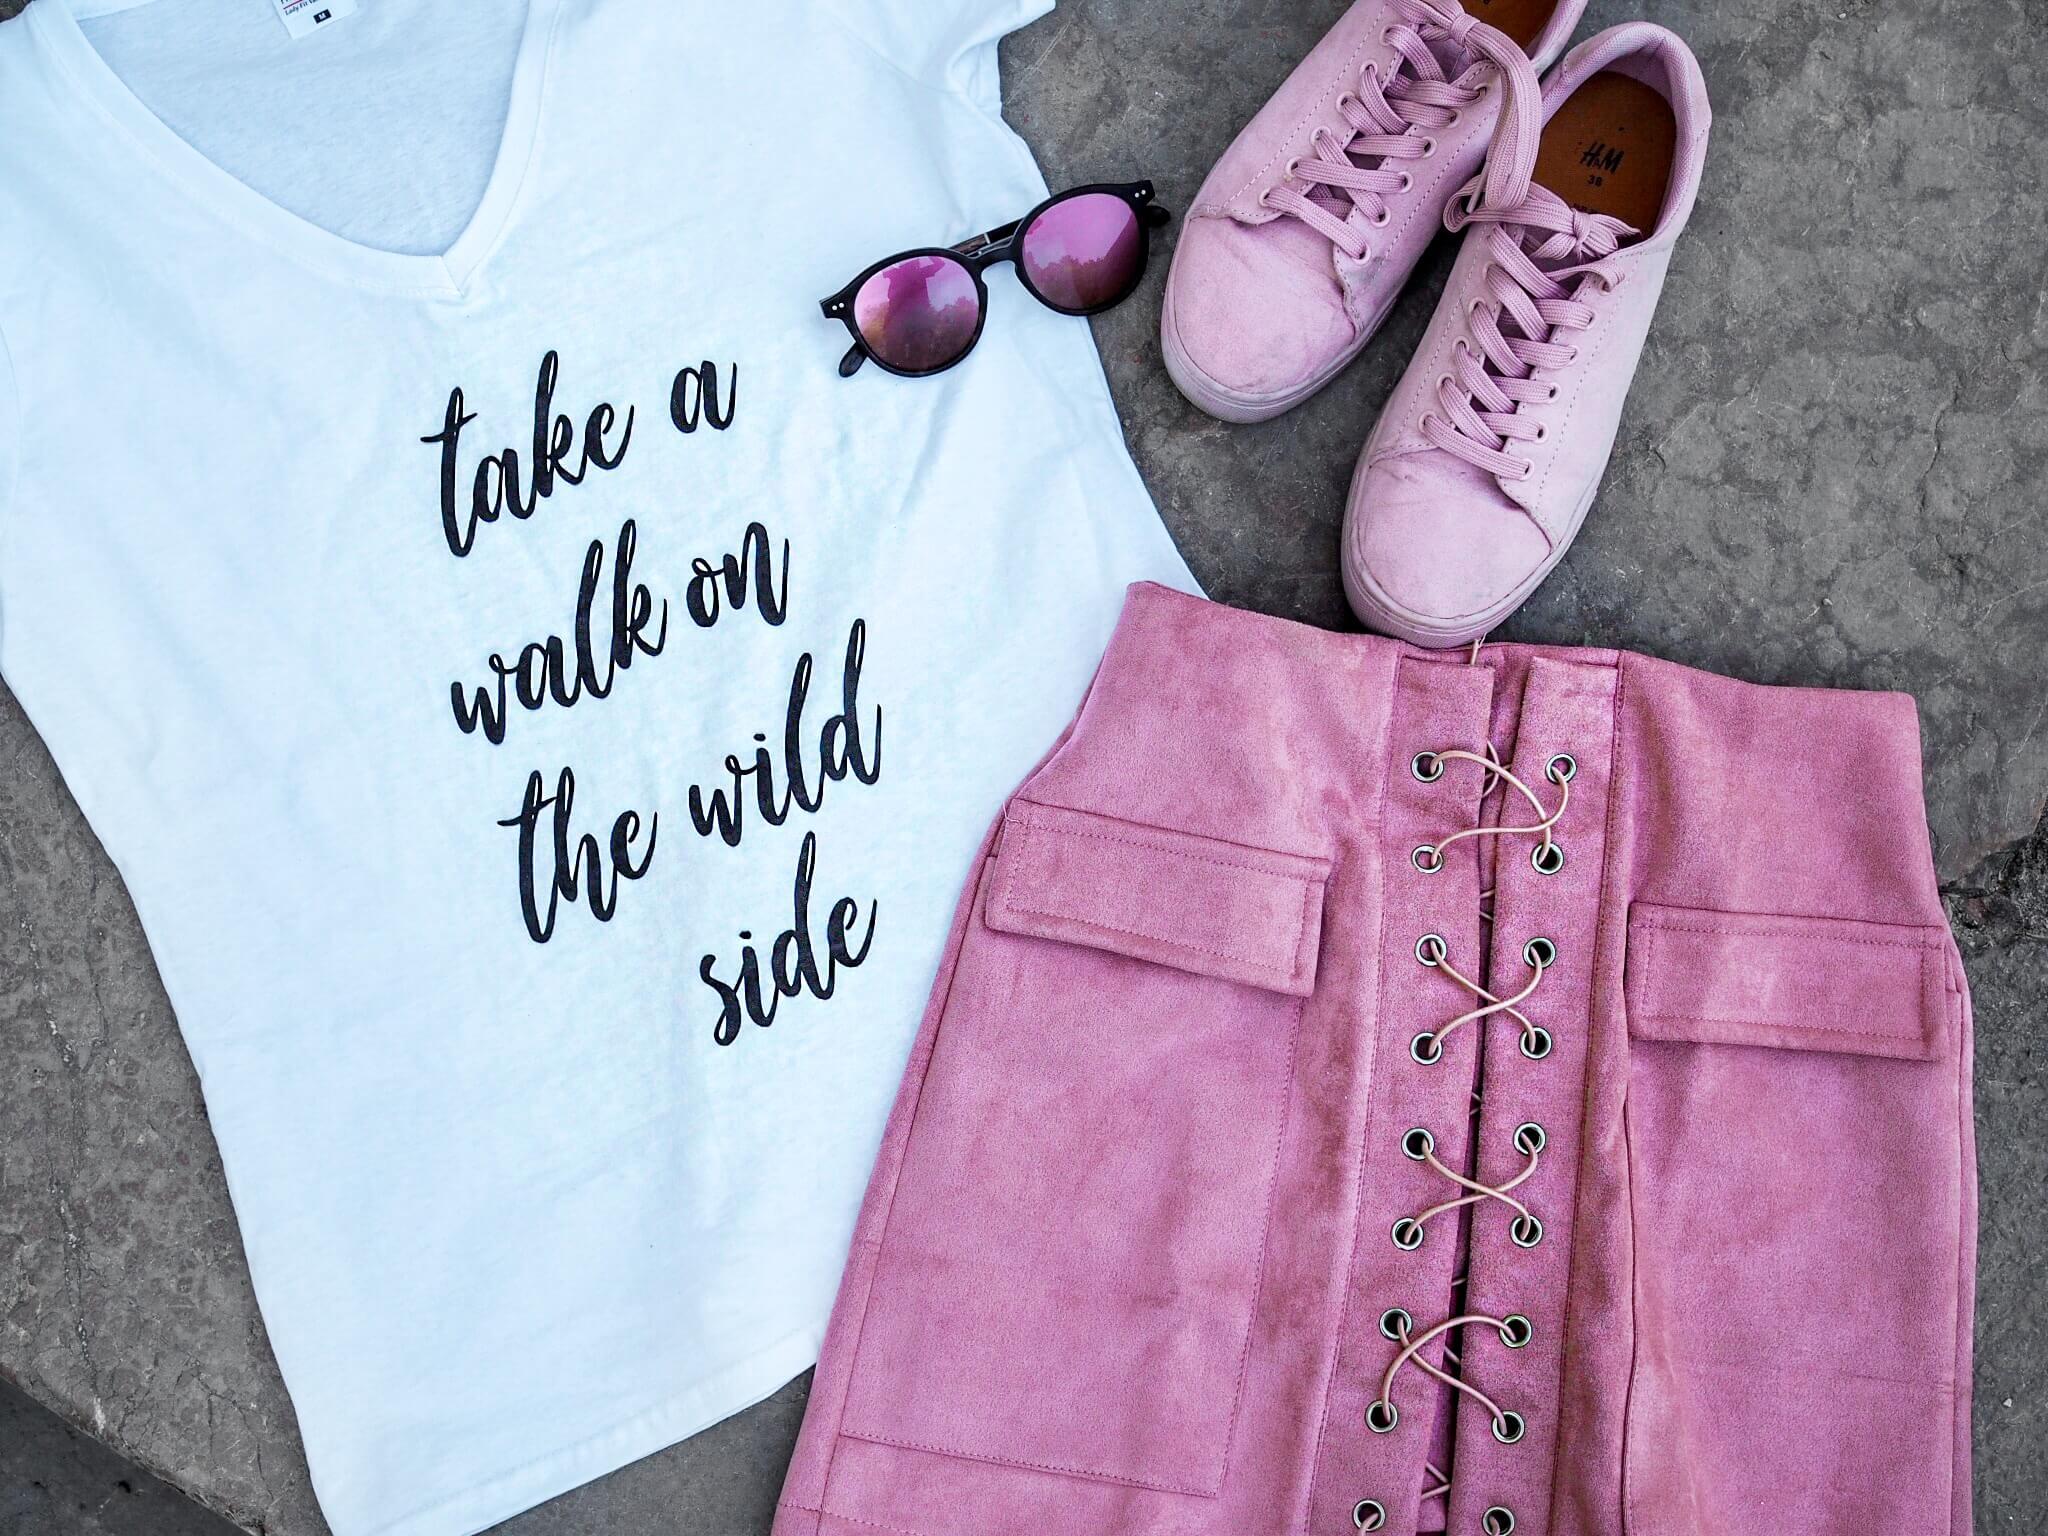 Modeblog Fashionblog Katefully München Shirt selber bedrucken gestalten DIY ootd Modeoutfit Rock Top rosa Streetstyle Fashiontipps Designerin